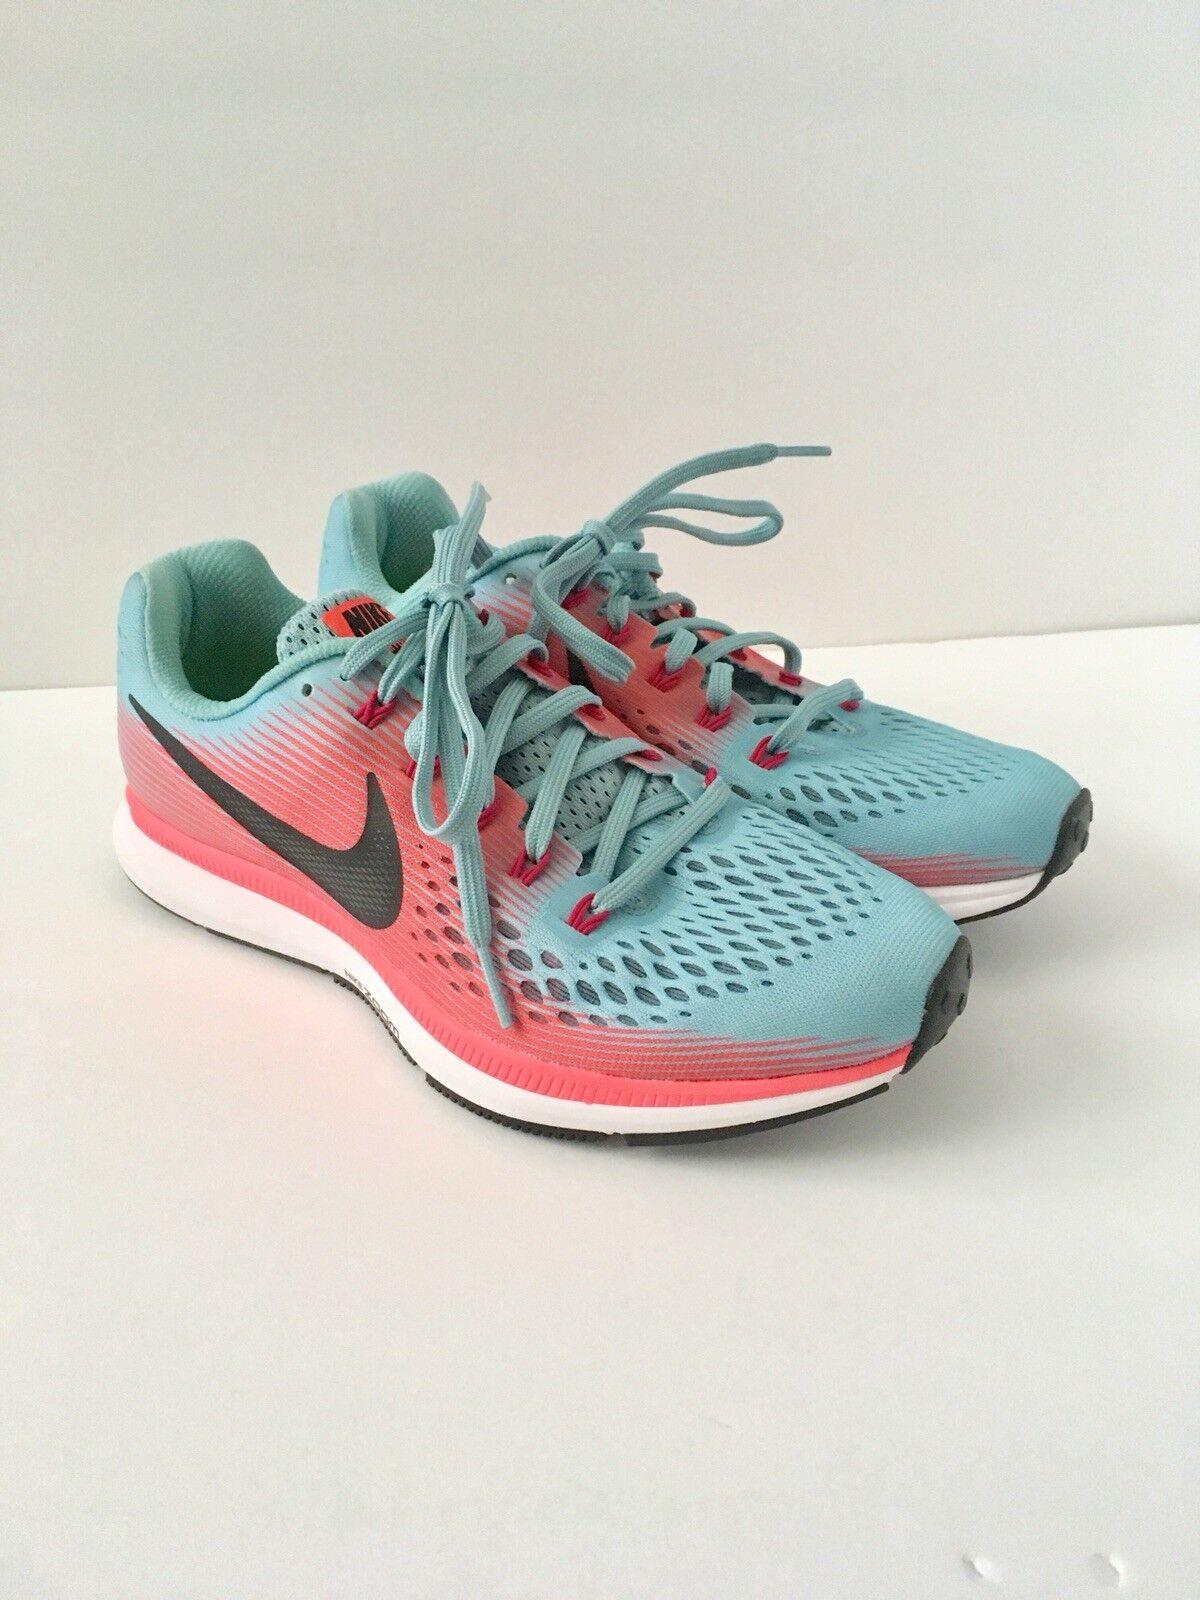 Nike Air Zoom Pegasus 34 Women Mica bluee Racer Pink 880560-406 Running shoes 8.5